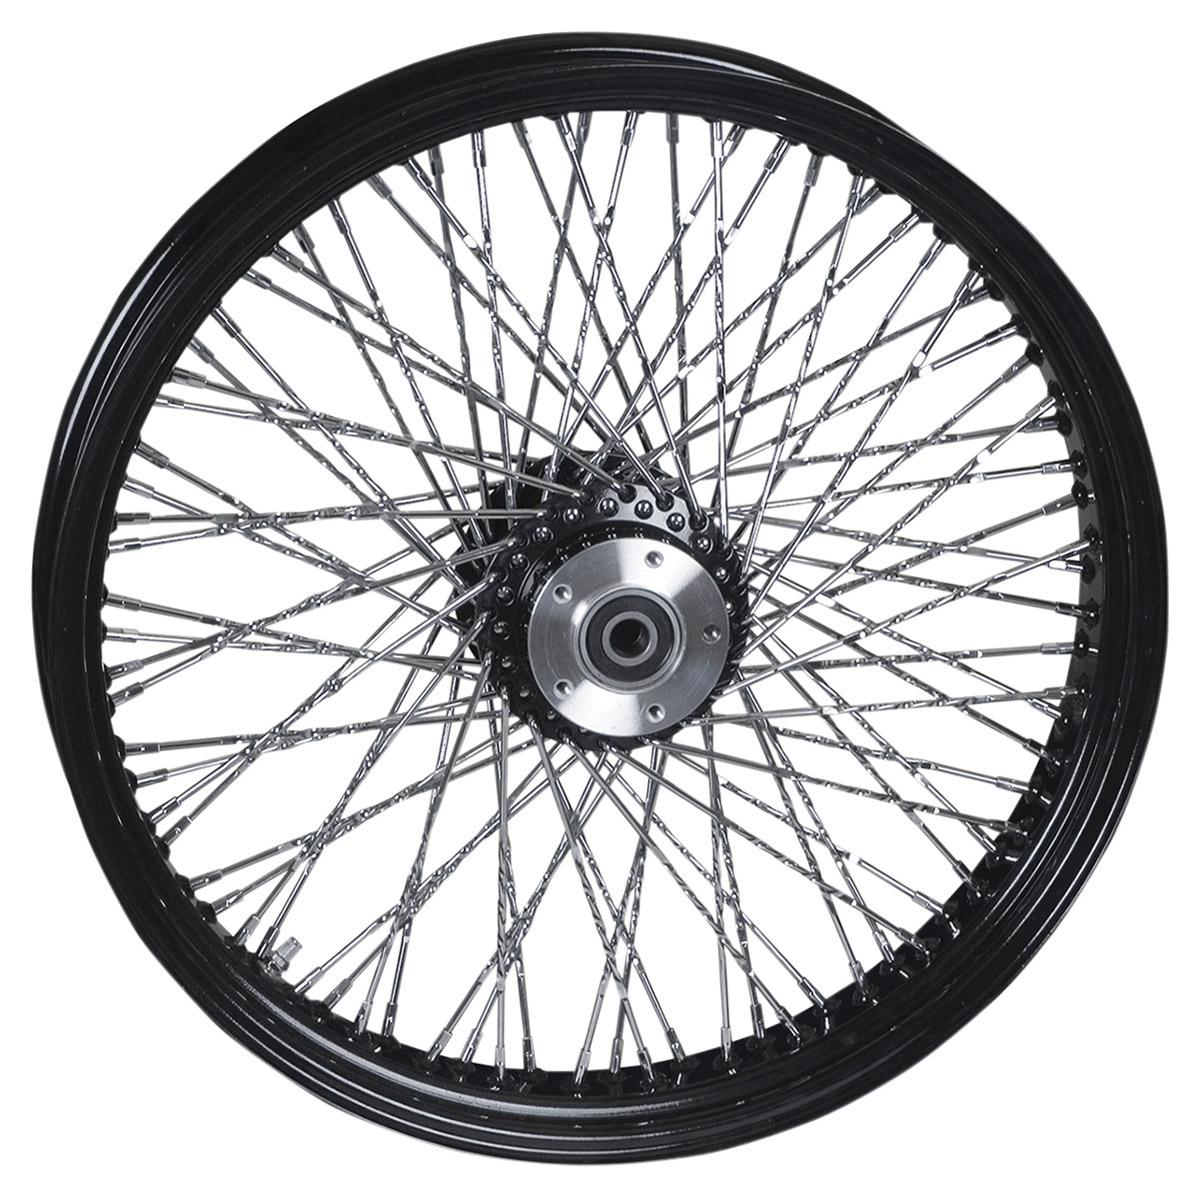 Paughco Black 80 Spoke Front Wheel 21 X 3 5